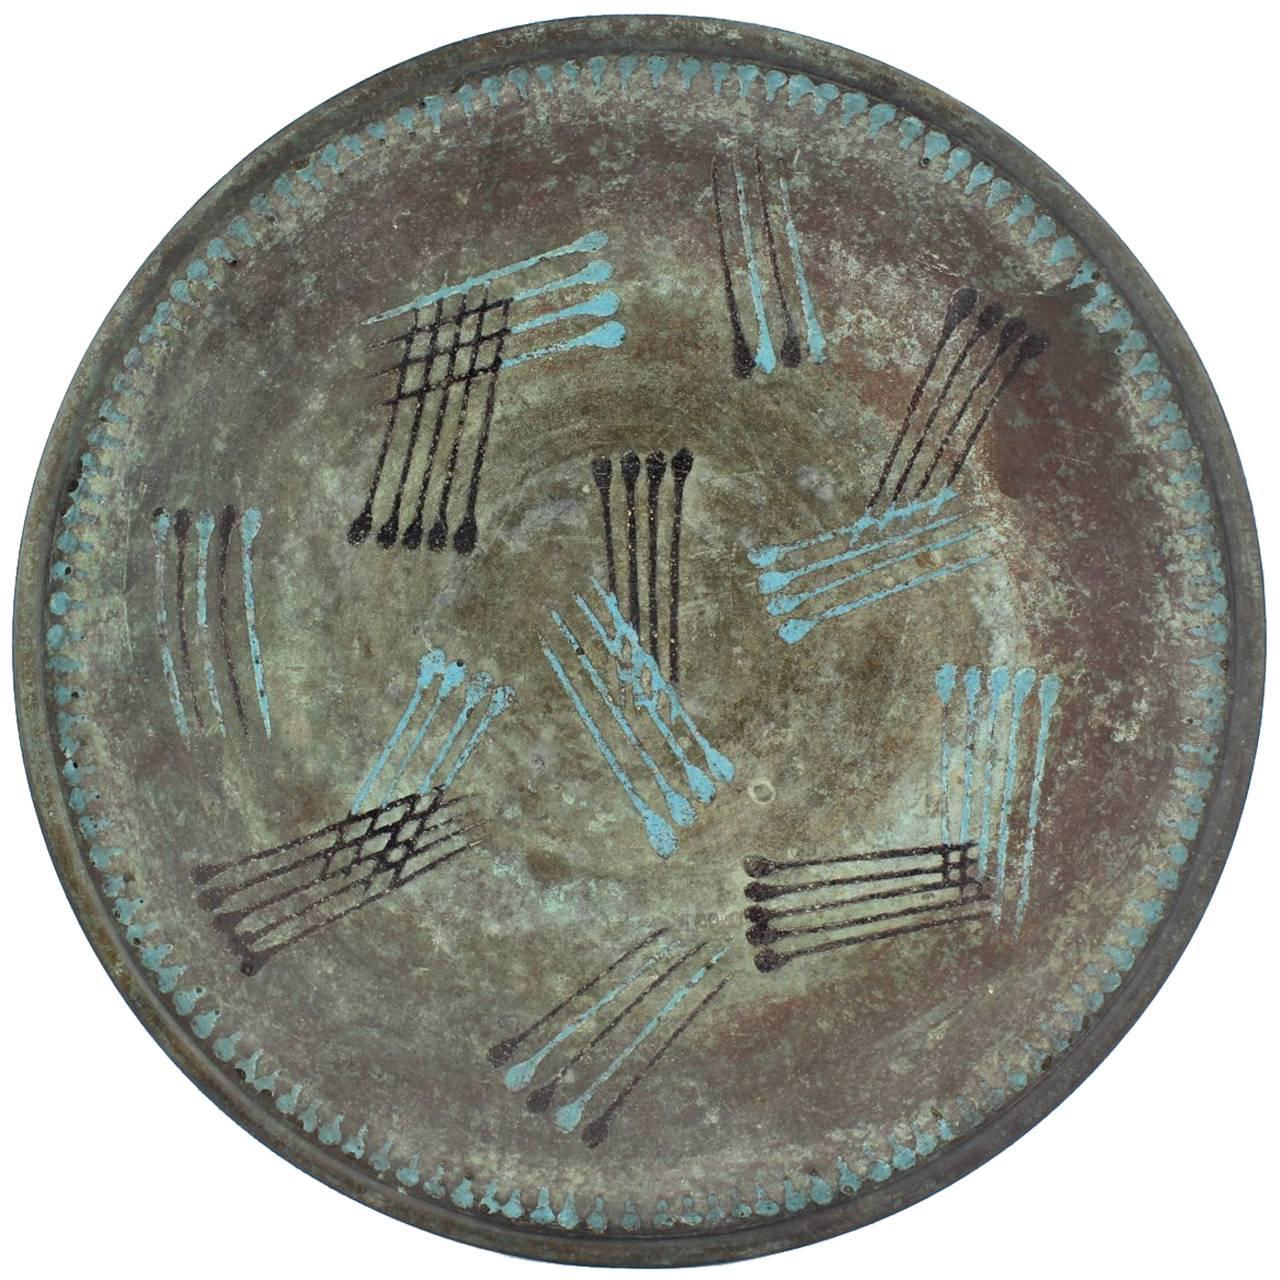 Primavera HM French Art Deco 'Plat Circulaire' Champlevé Bronze Plate, 1920s